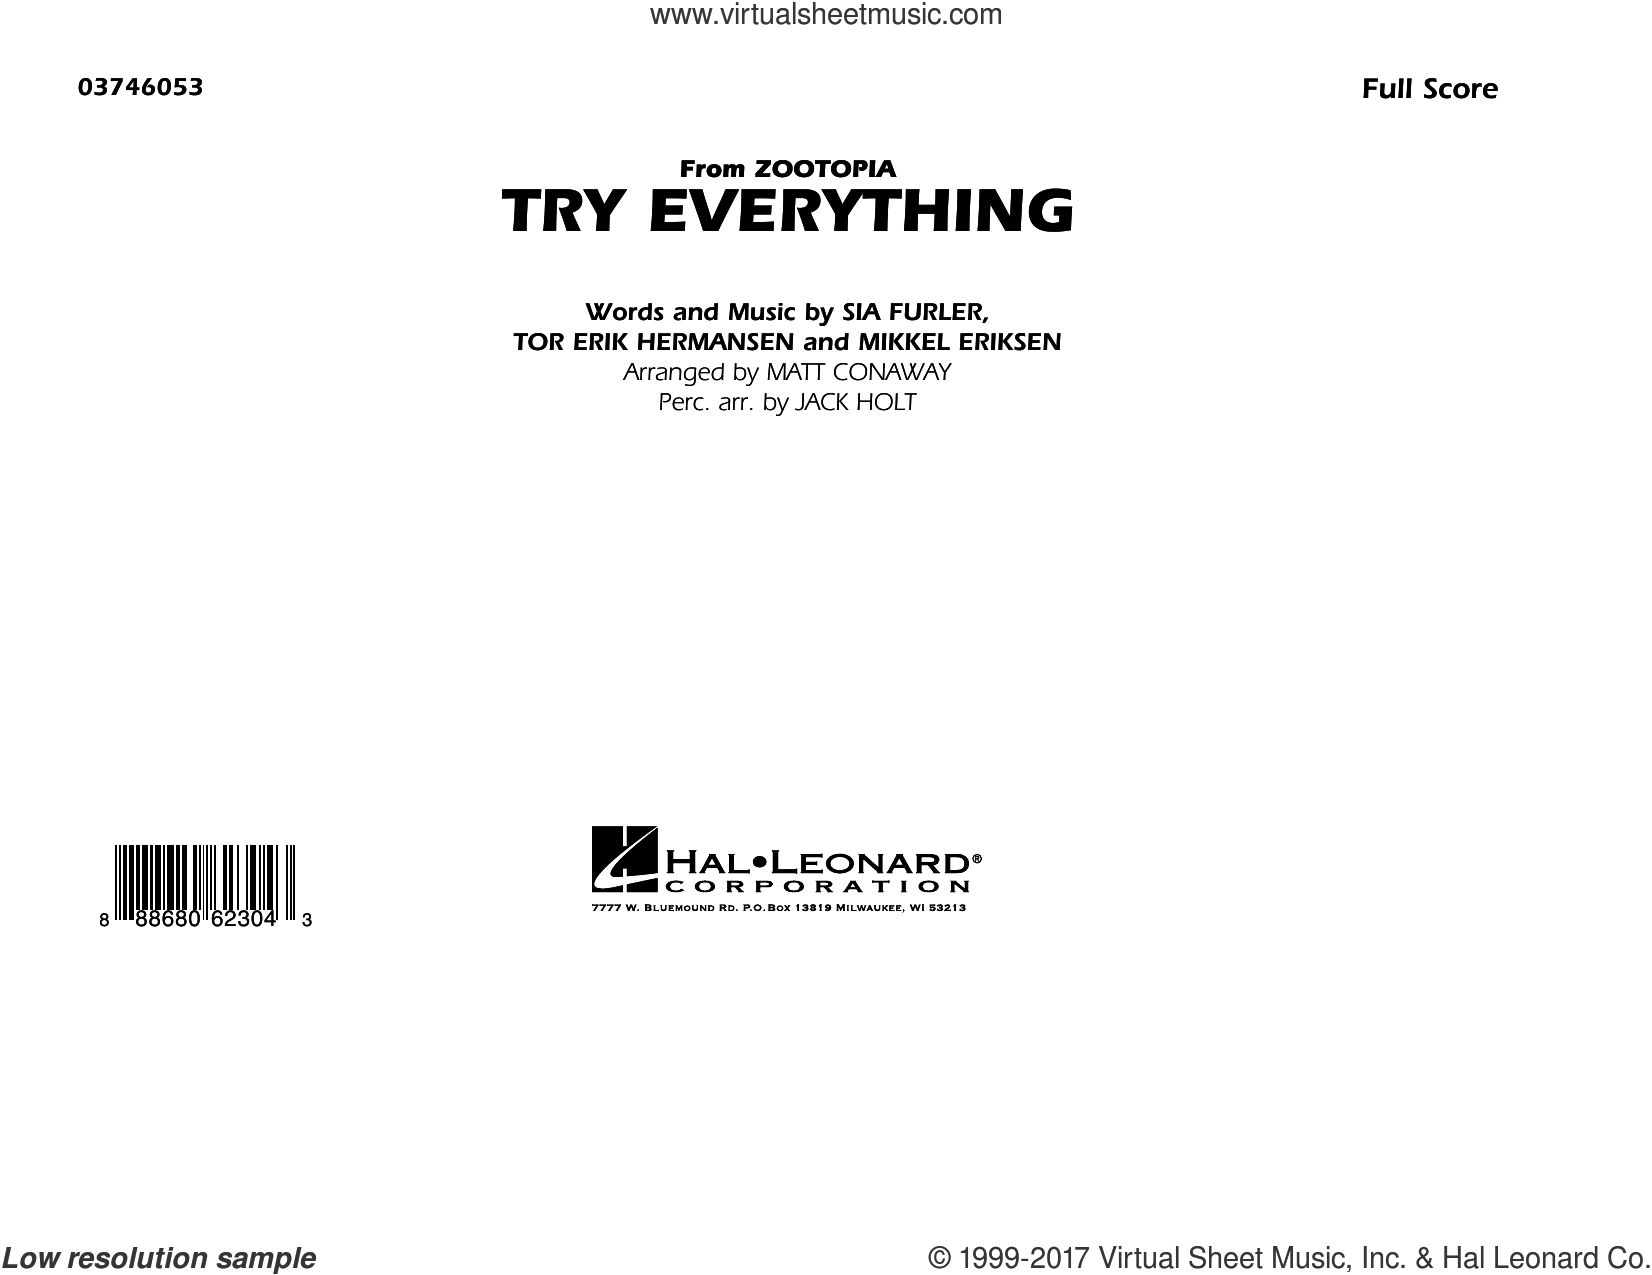 Try Everything (from Zootopia) (COMPLETE) sheet music for marching band by Matt Conaway, Mikkel Eriksen, Shakira, Sia Furler and Tor Erik Hermansen, intermediate skill level